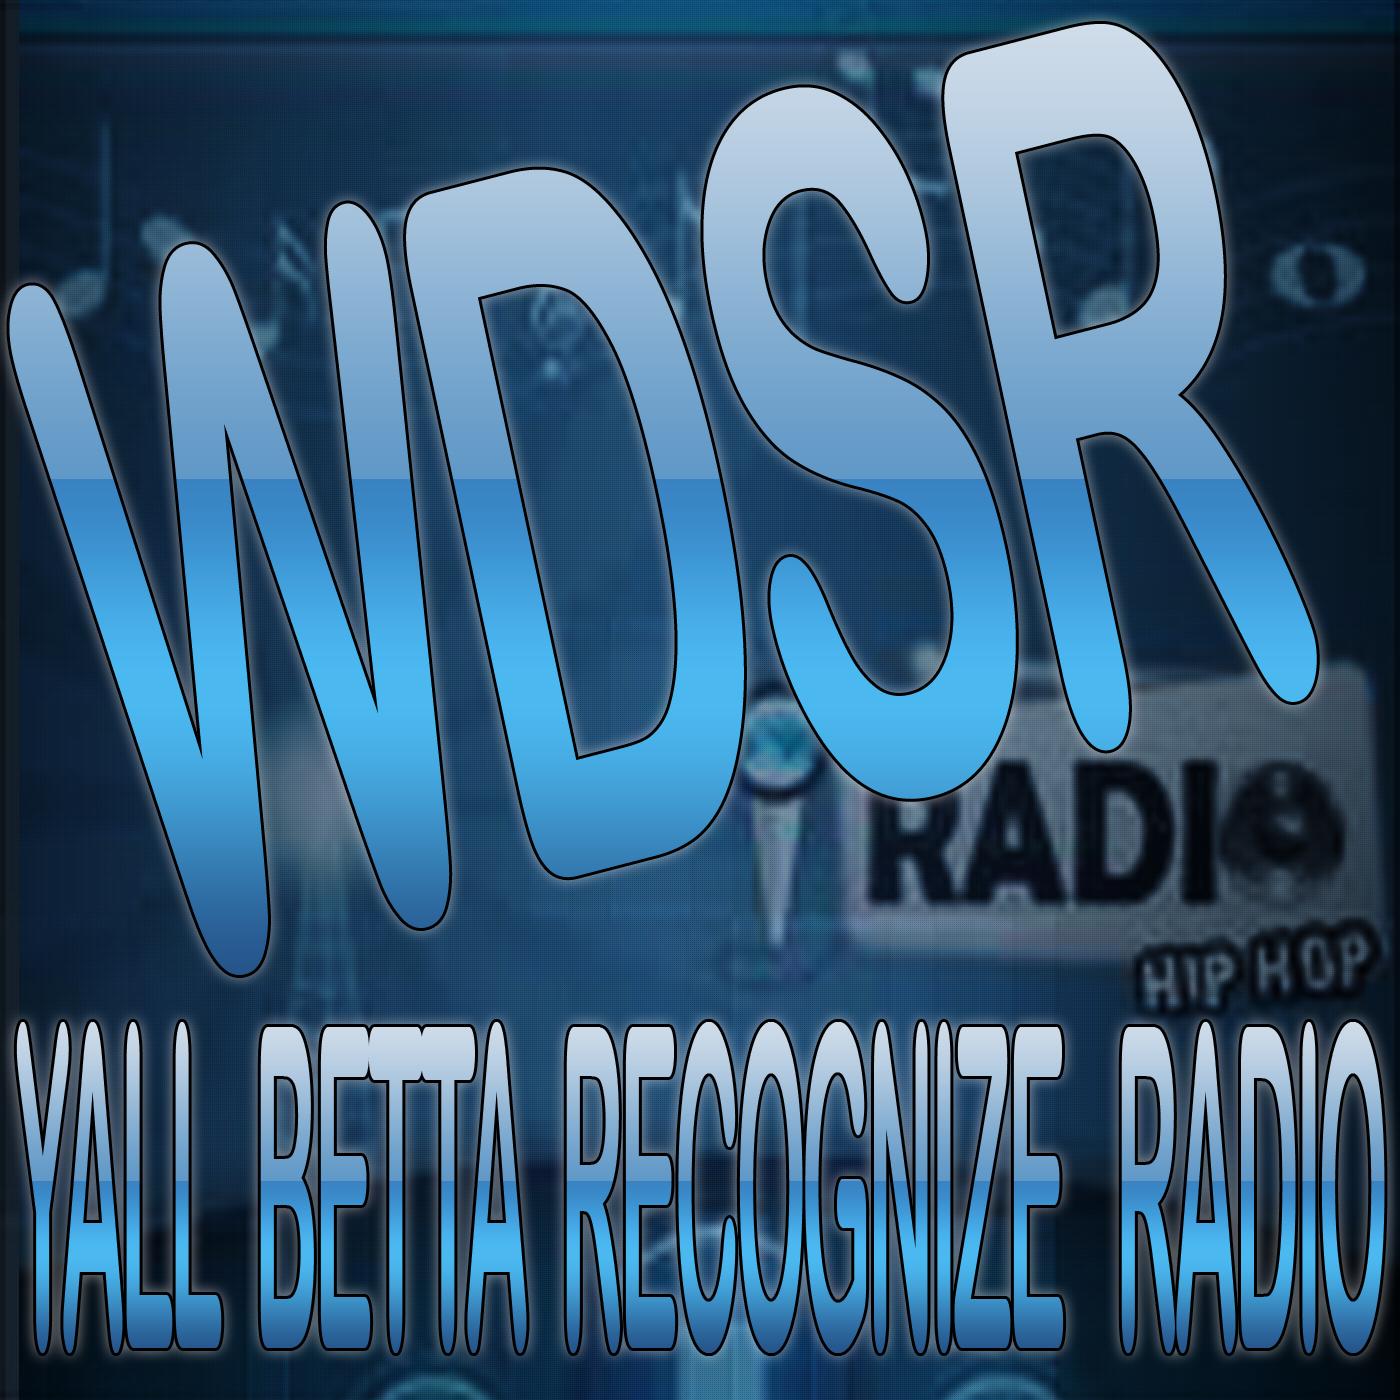 WDSR Radio